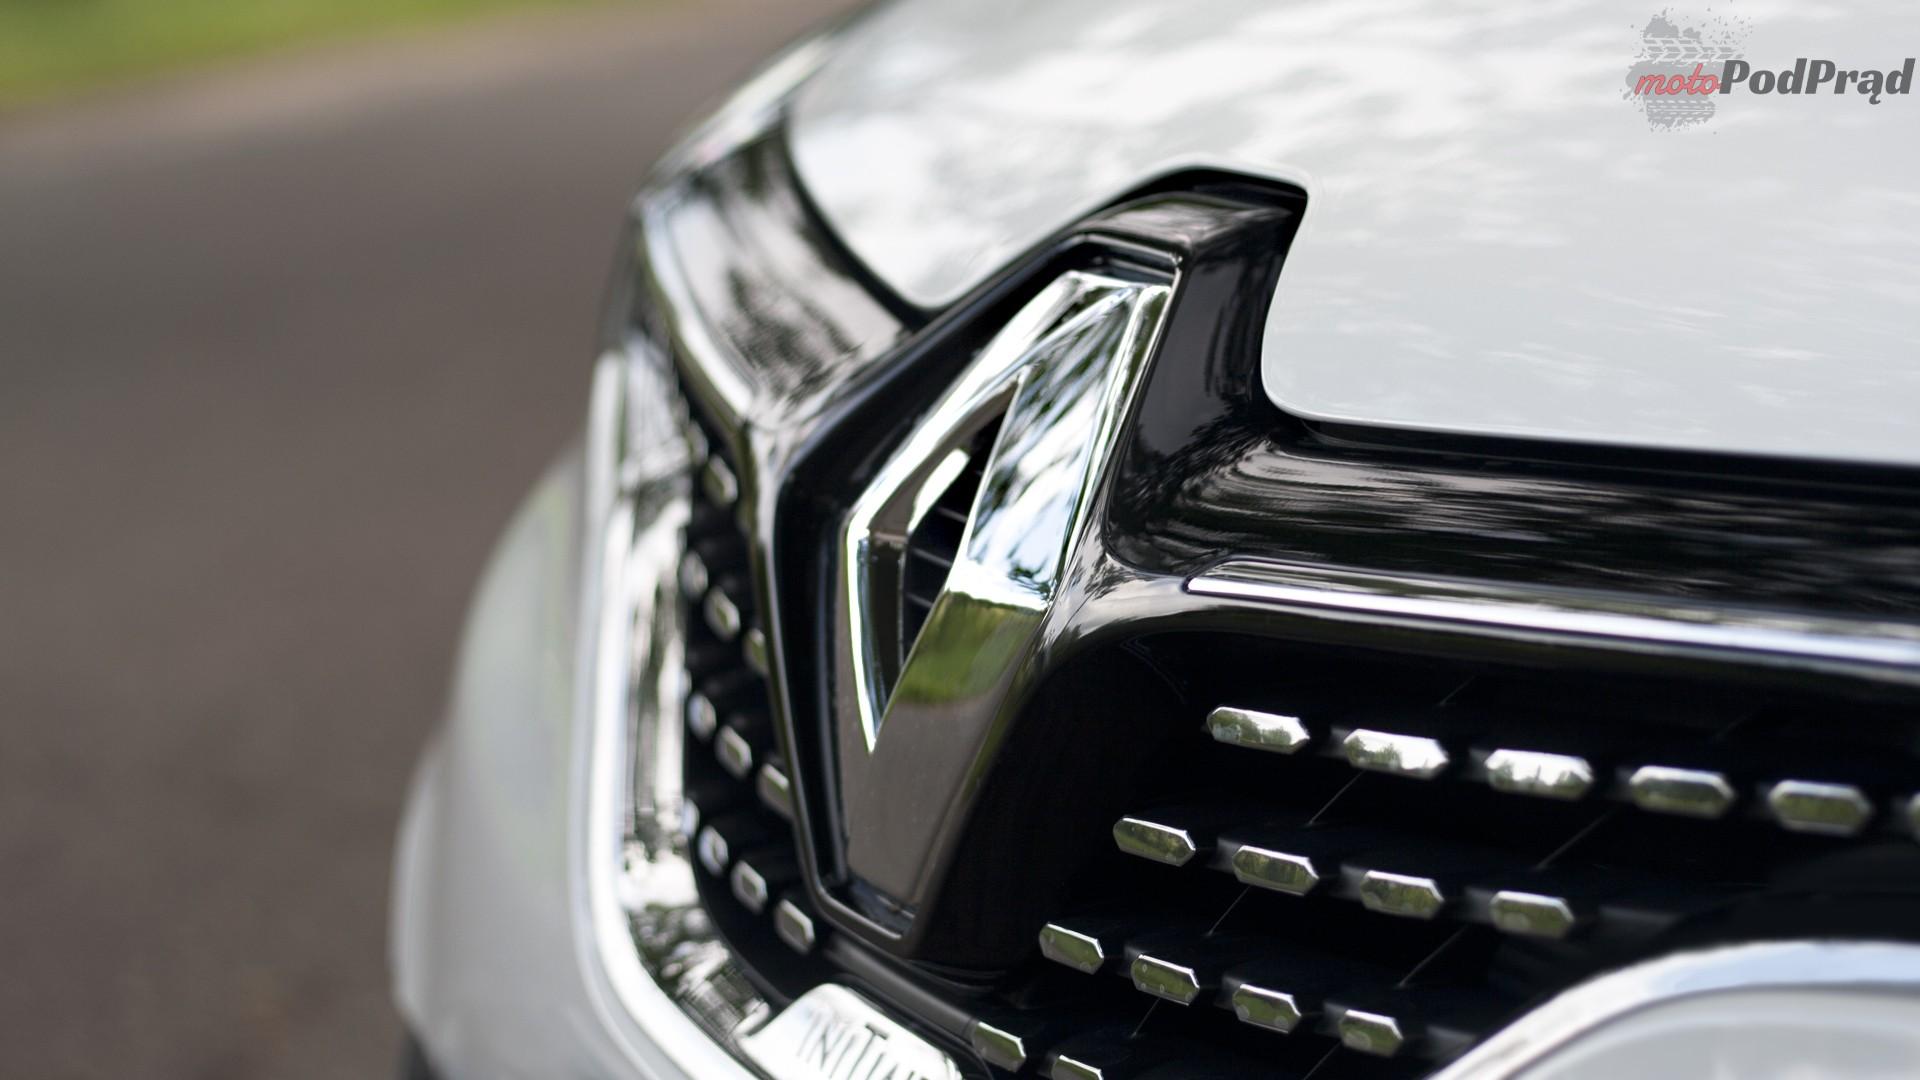 6 1 Test: Renault Captur Initiale Paris 1.2 Tce   diament w koronie?